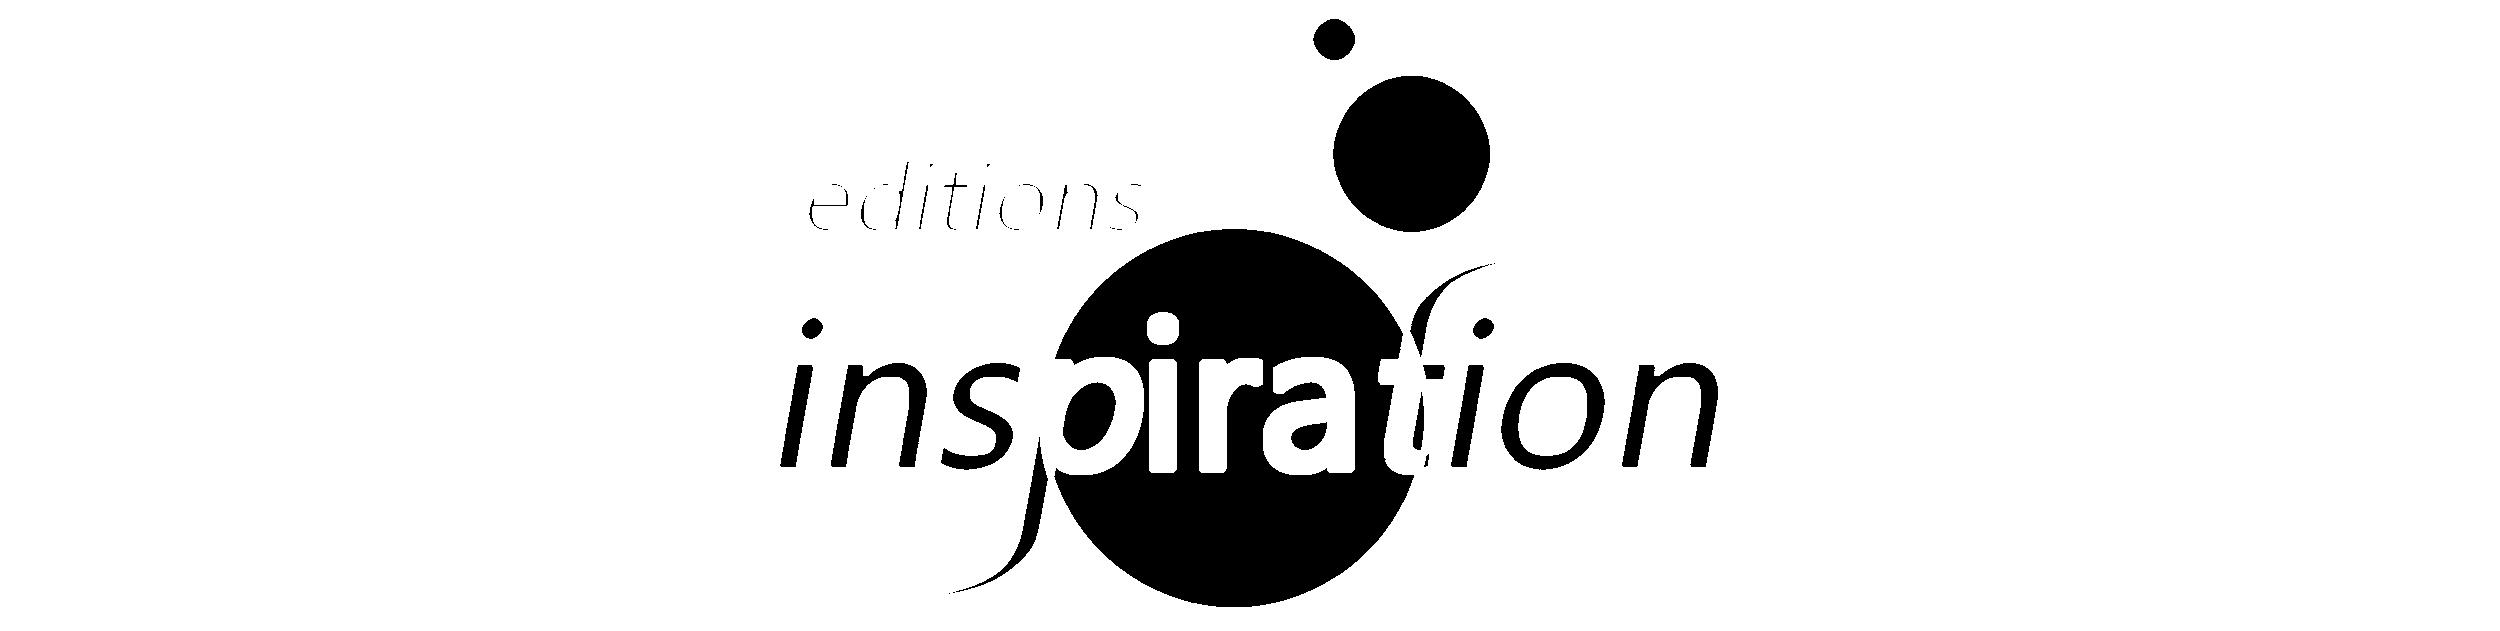 editions inspiration 2017 blanc bandeau